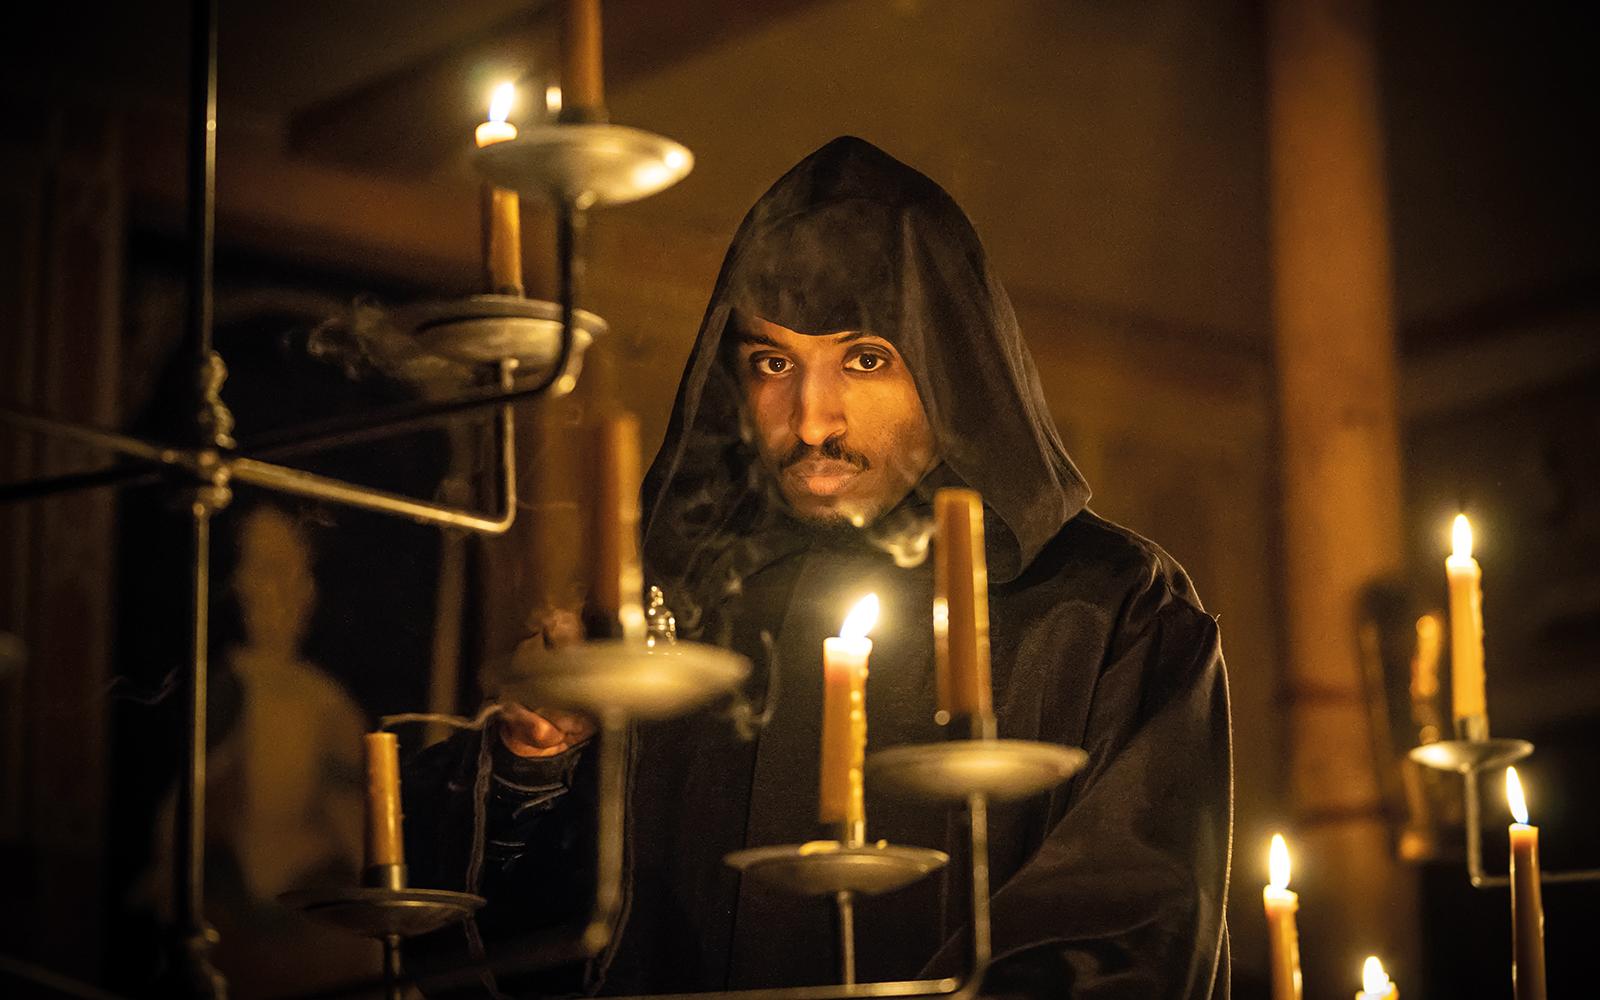 Candles-lit-Edward II-whatson-standardimage